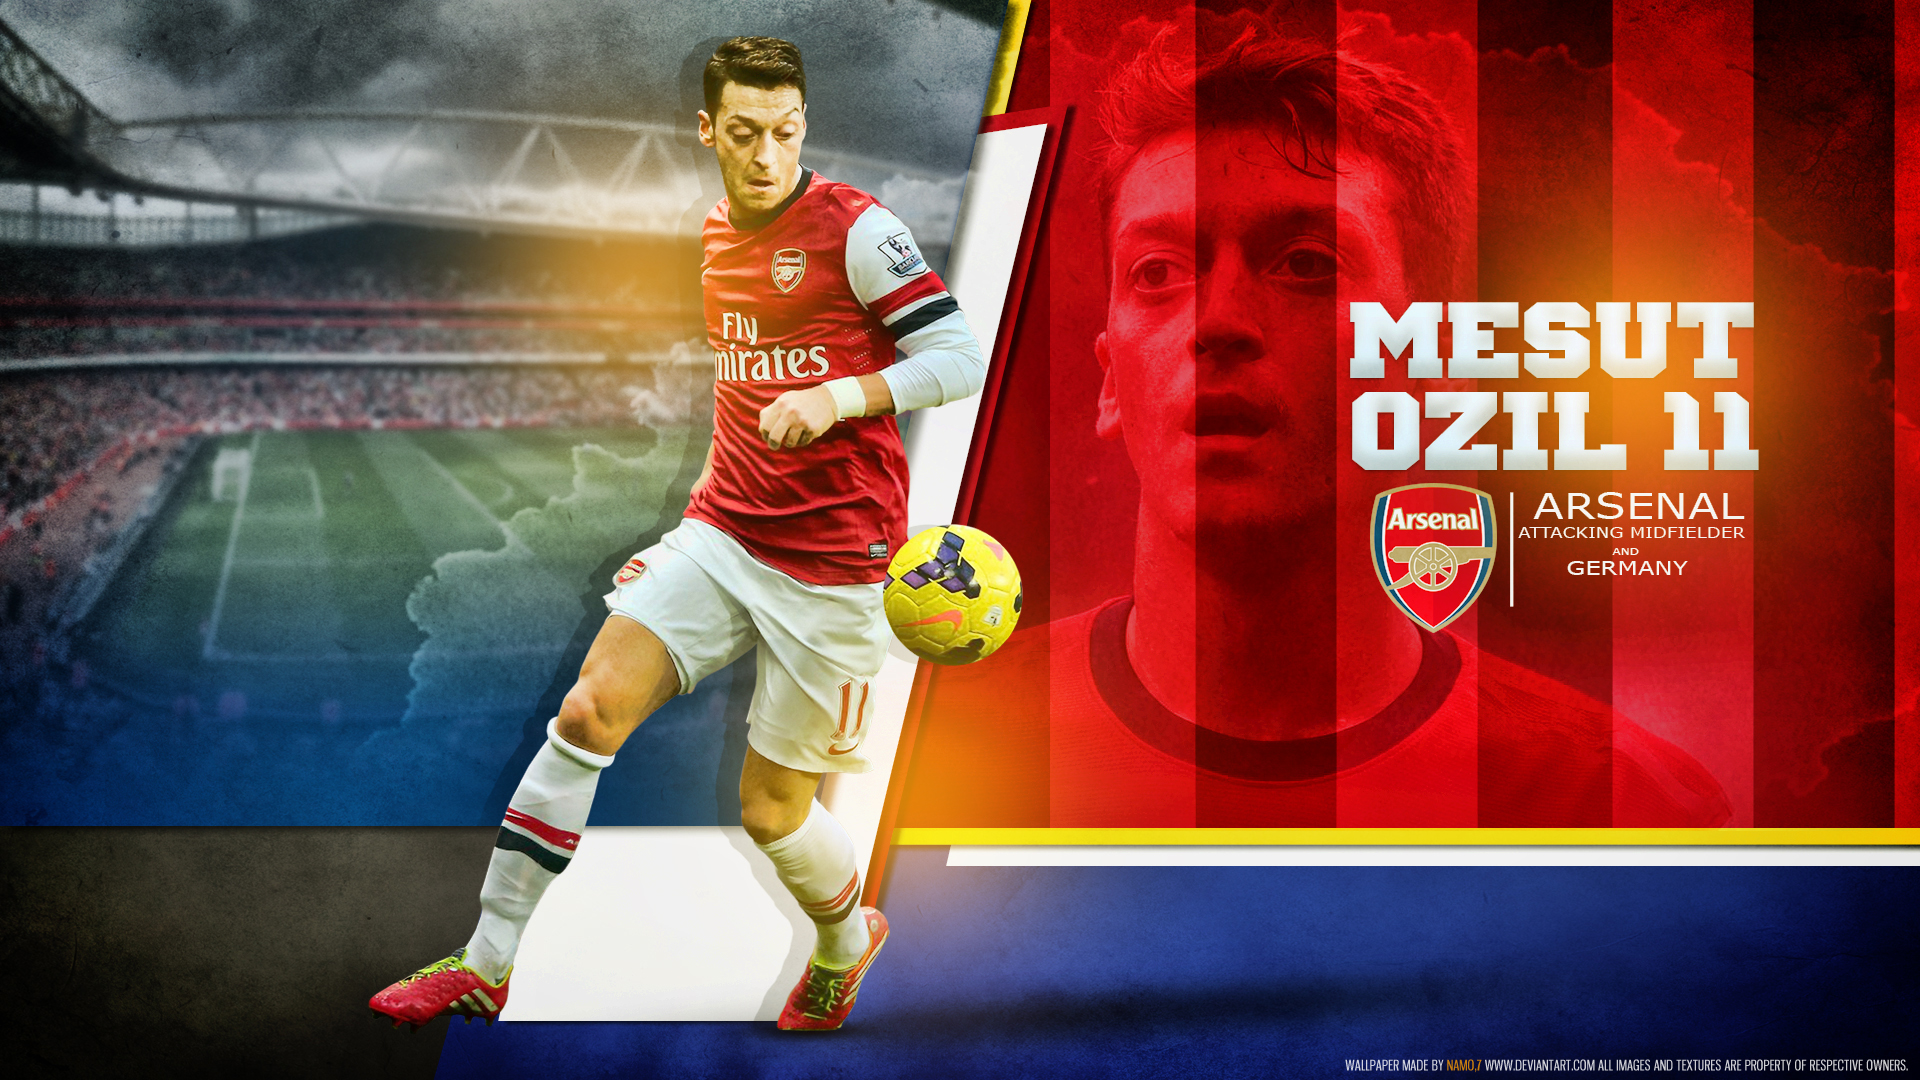 Mesut Ozil Arsenal 2015 newhairstylesformen2014com 1920x1080